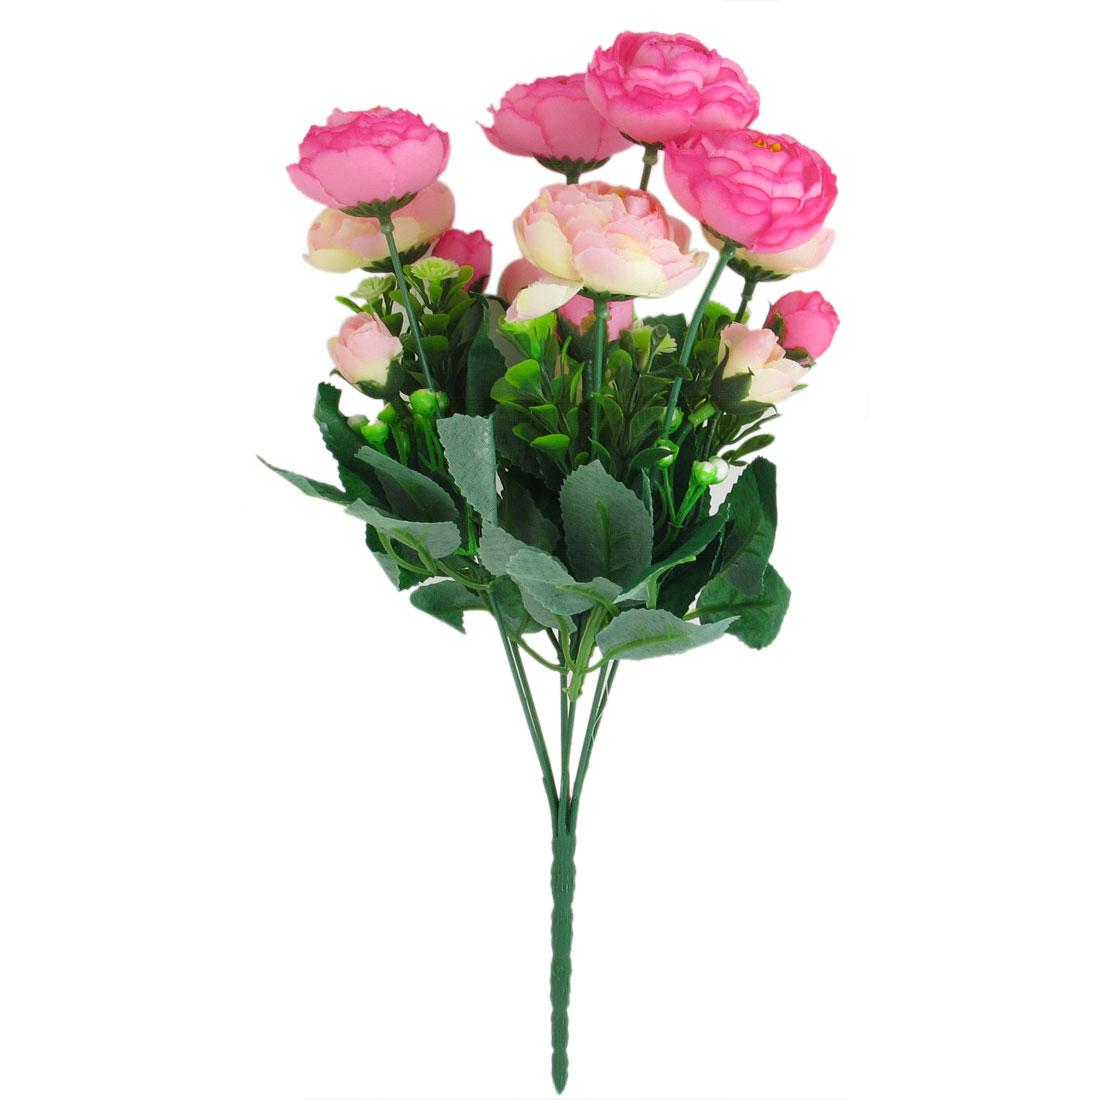 Artificial Emulational Green Leaf Fabric Flower Bouquet Party Wedding Decor